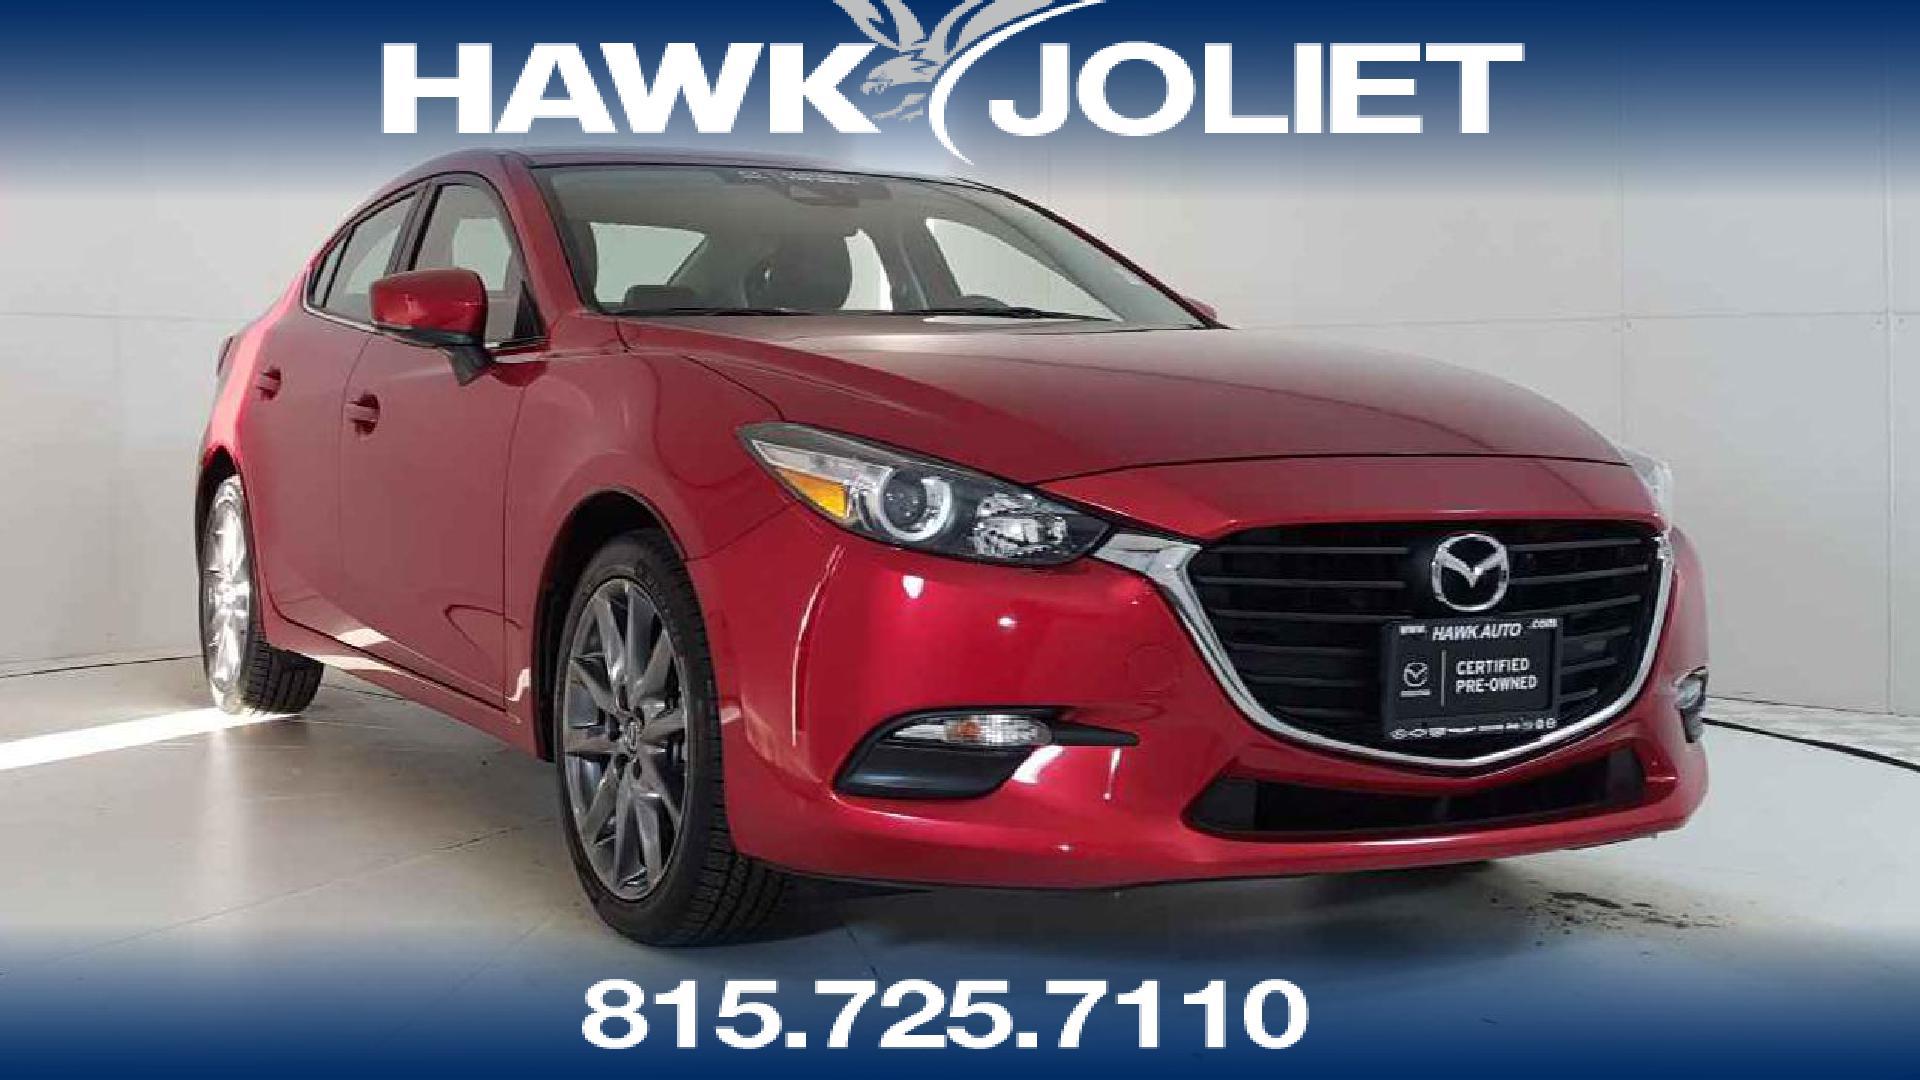 Used For Sale In Joliet Il Hawk Mazda 1987 Dodge Ram 50 Fuel Filter Location 2018 Mazda3 4 Door Vehicle Photo 60435